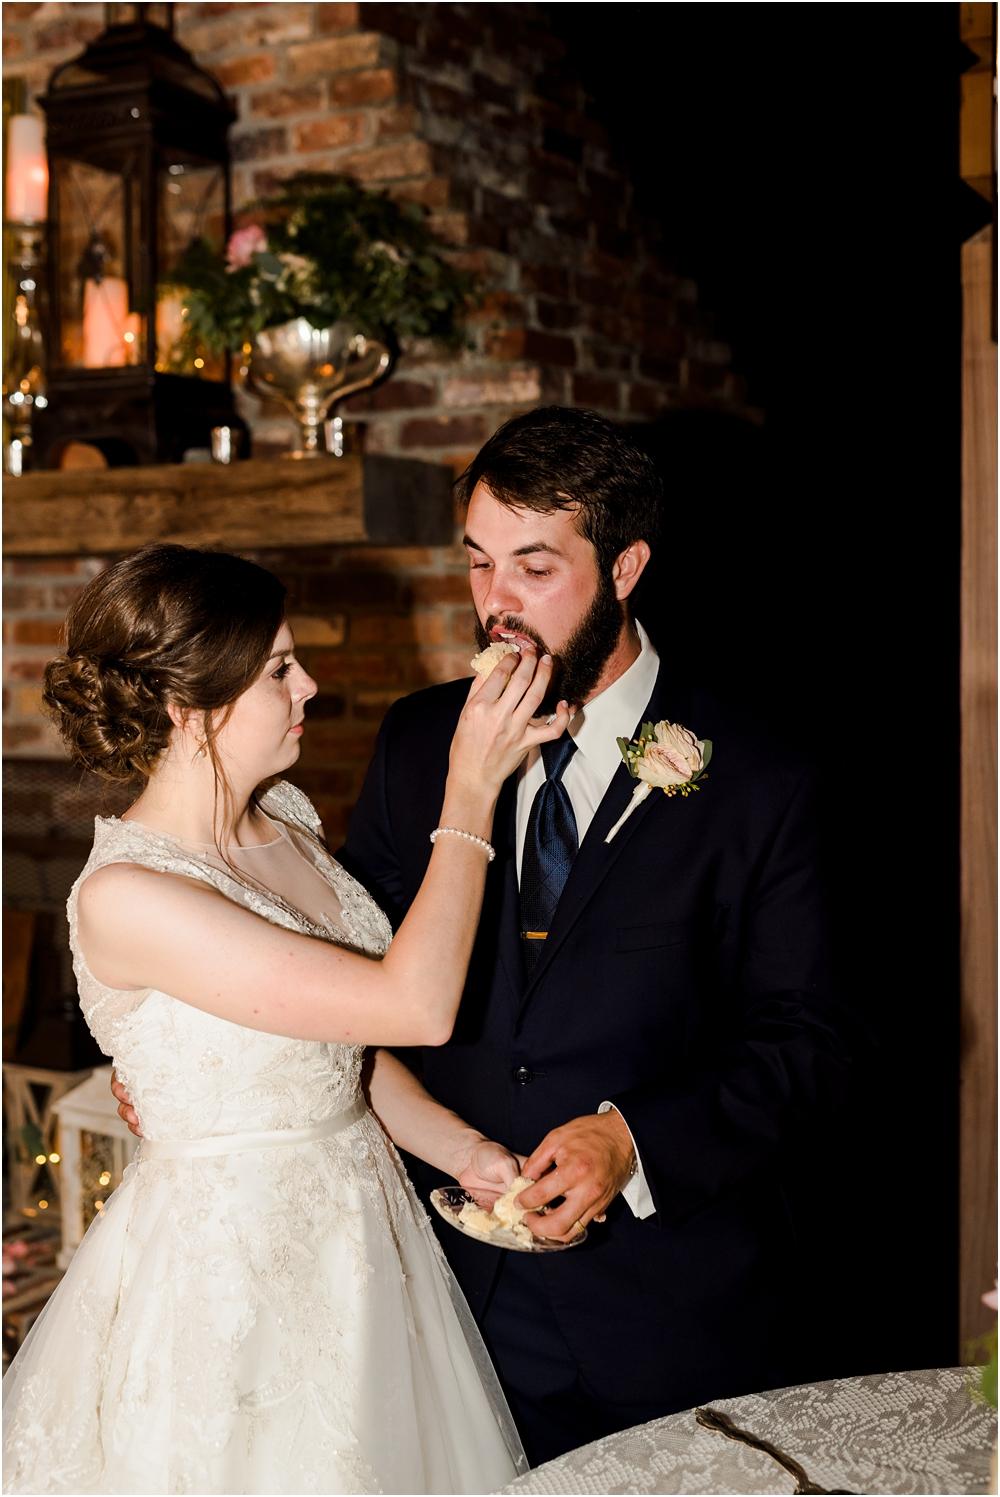 marianna-florida-wedding-photographer-kiersten-grant-188.jpg